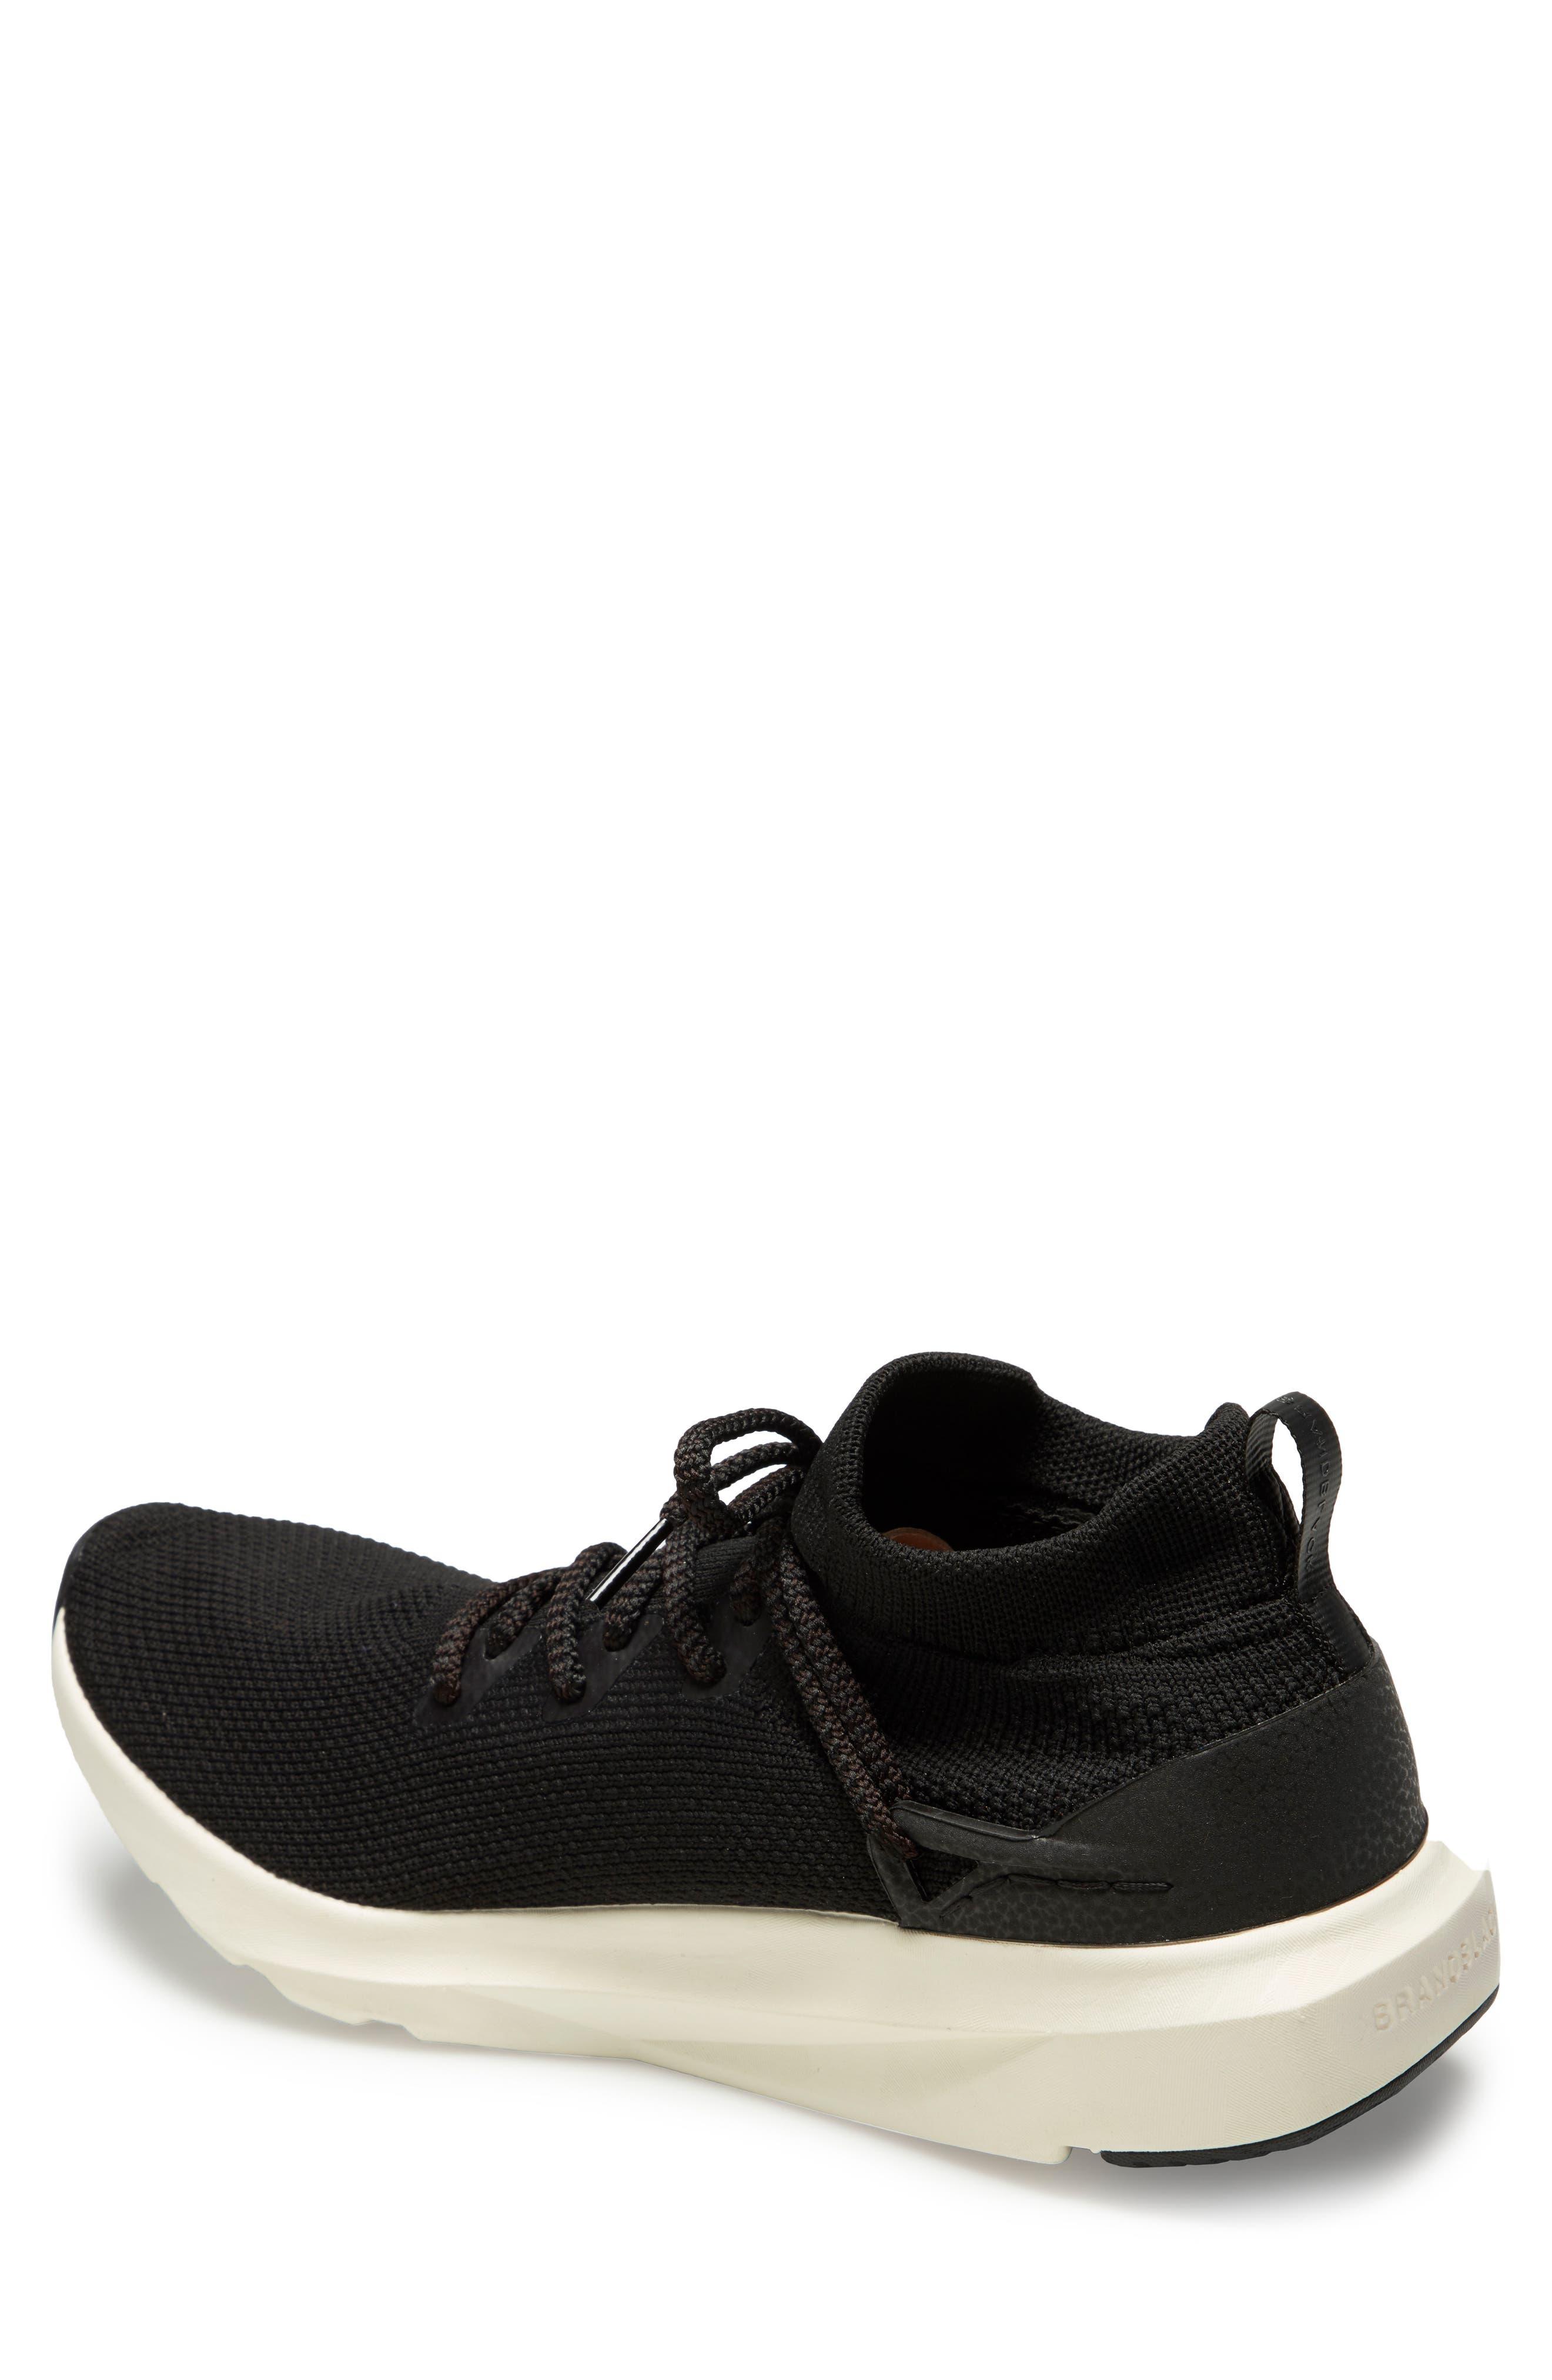 Kaze Sneaker,                             Alternate thumbnail 4, color,